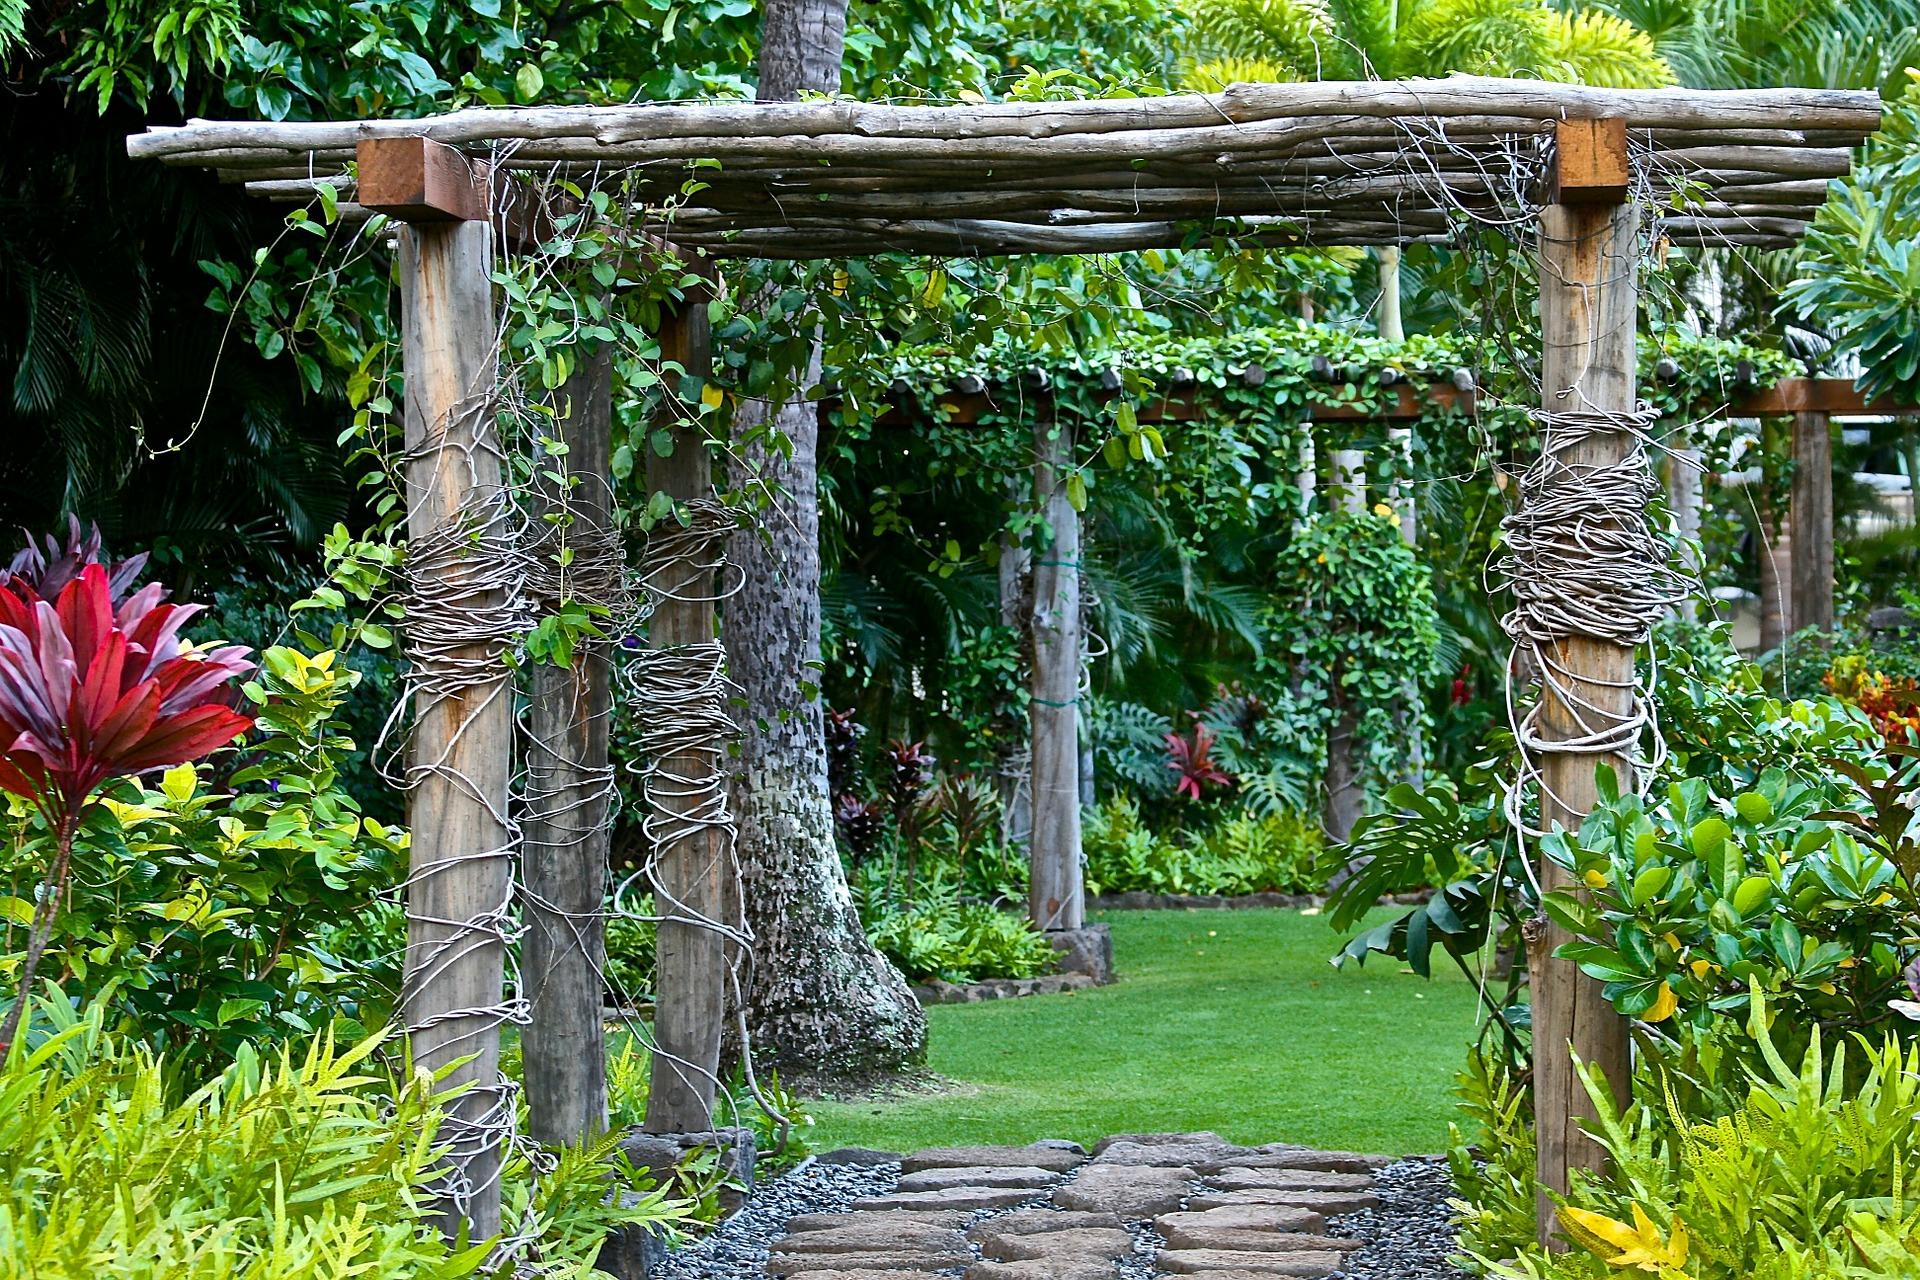 Simple landscaping ideas for artistic garden design with for Garden design reddit